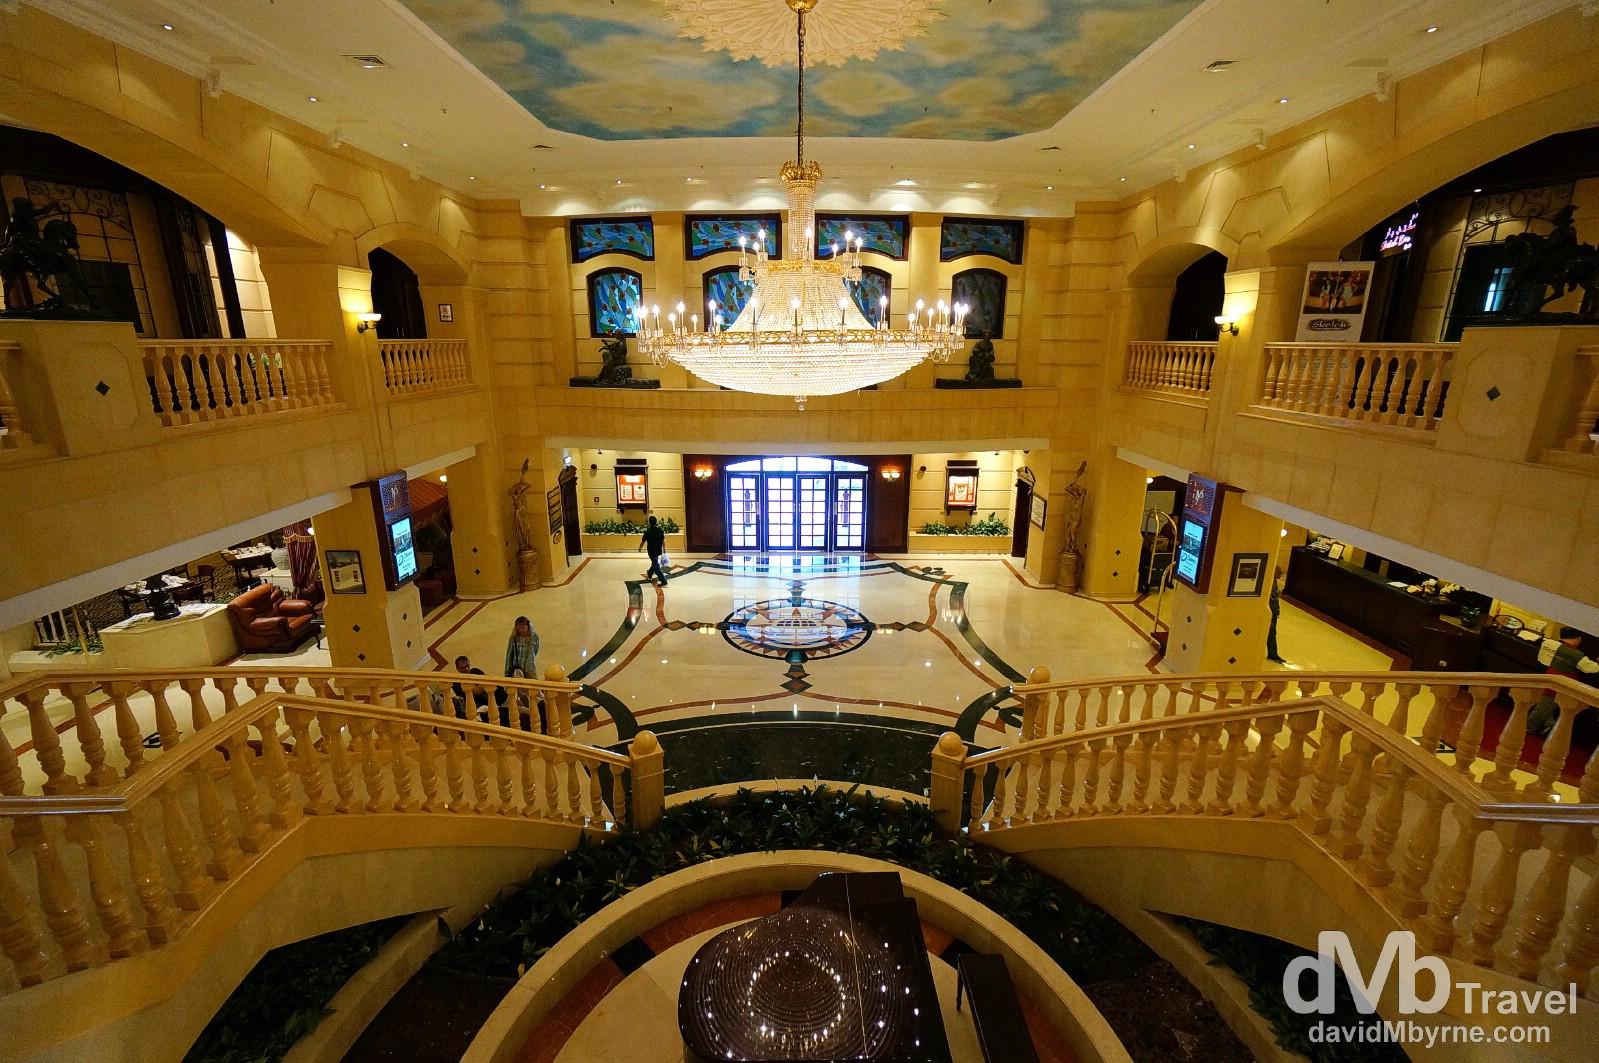 The main foyer of the 5-star Metropolitan Palace in Deira, Dubai, UAE. April 18th, 2014.